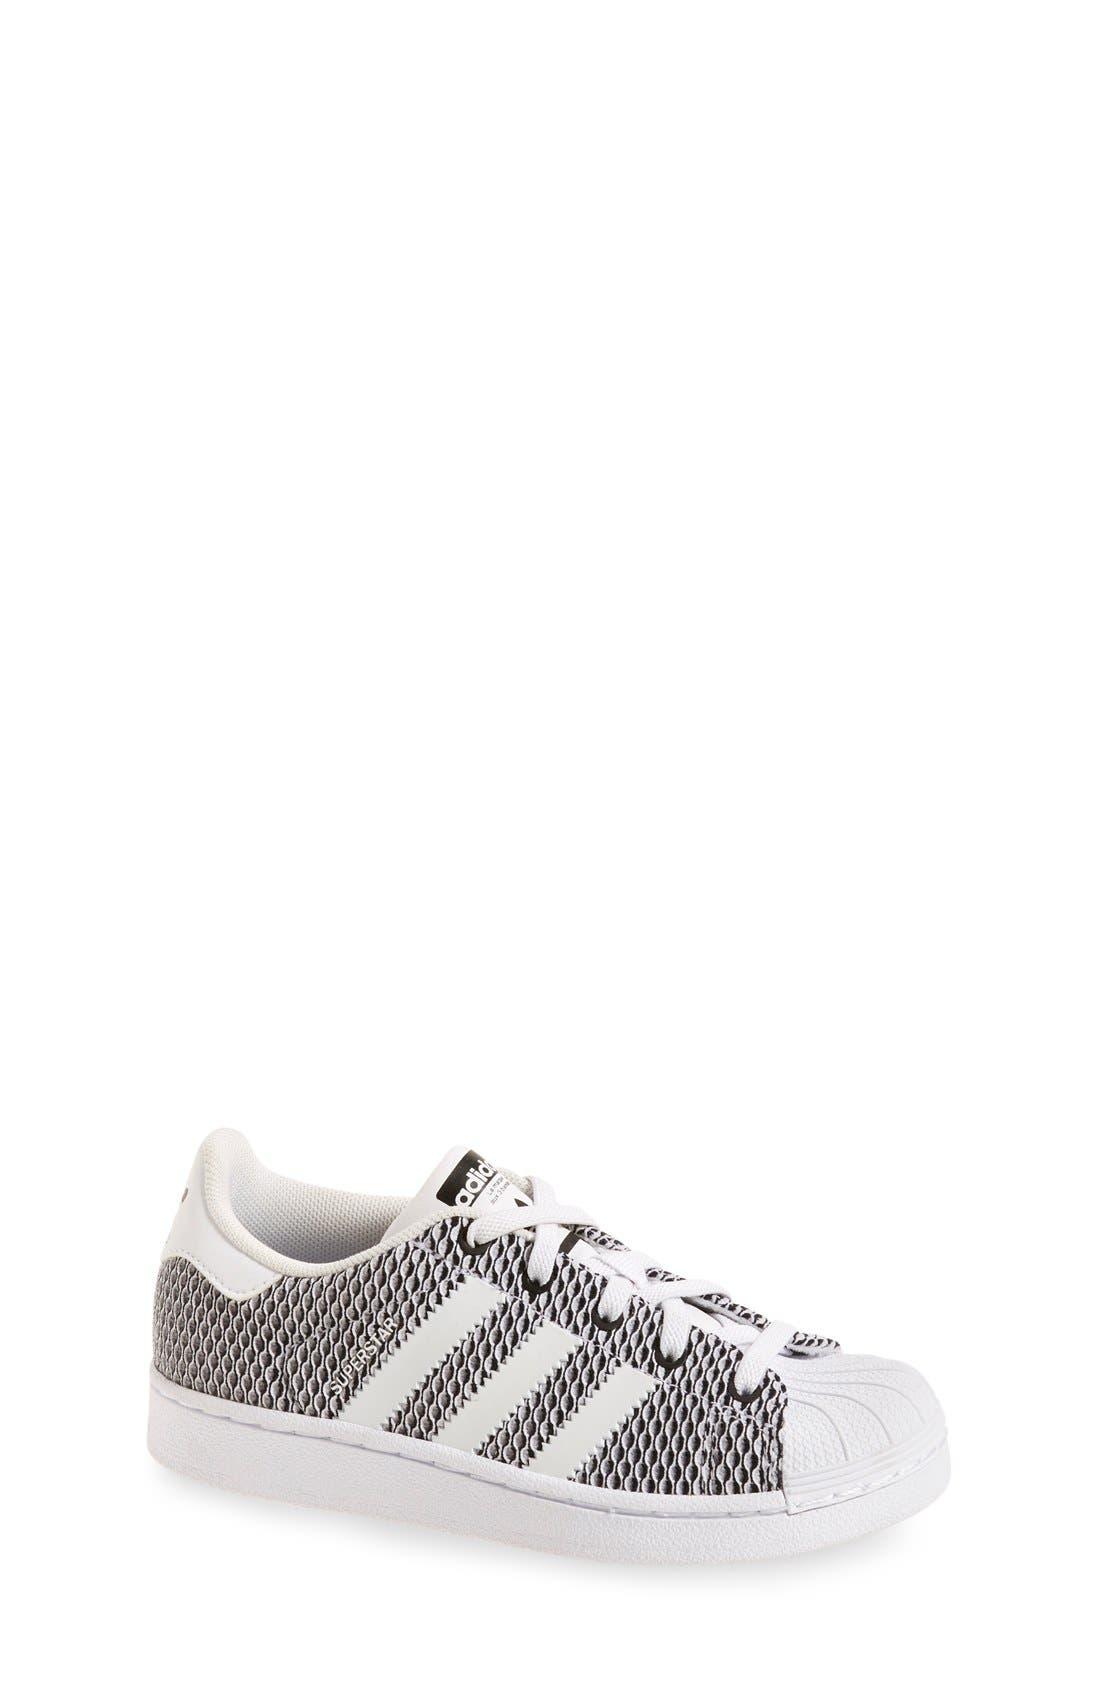 'Superstar - Color Shift' Sneaker,                             Main thumbnail 1, color,                             001